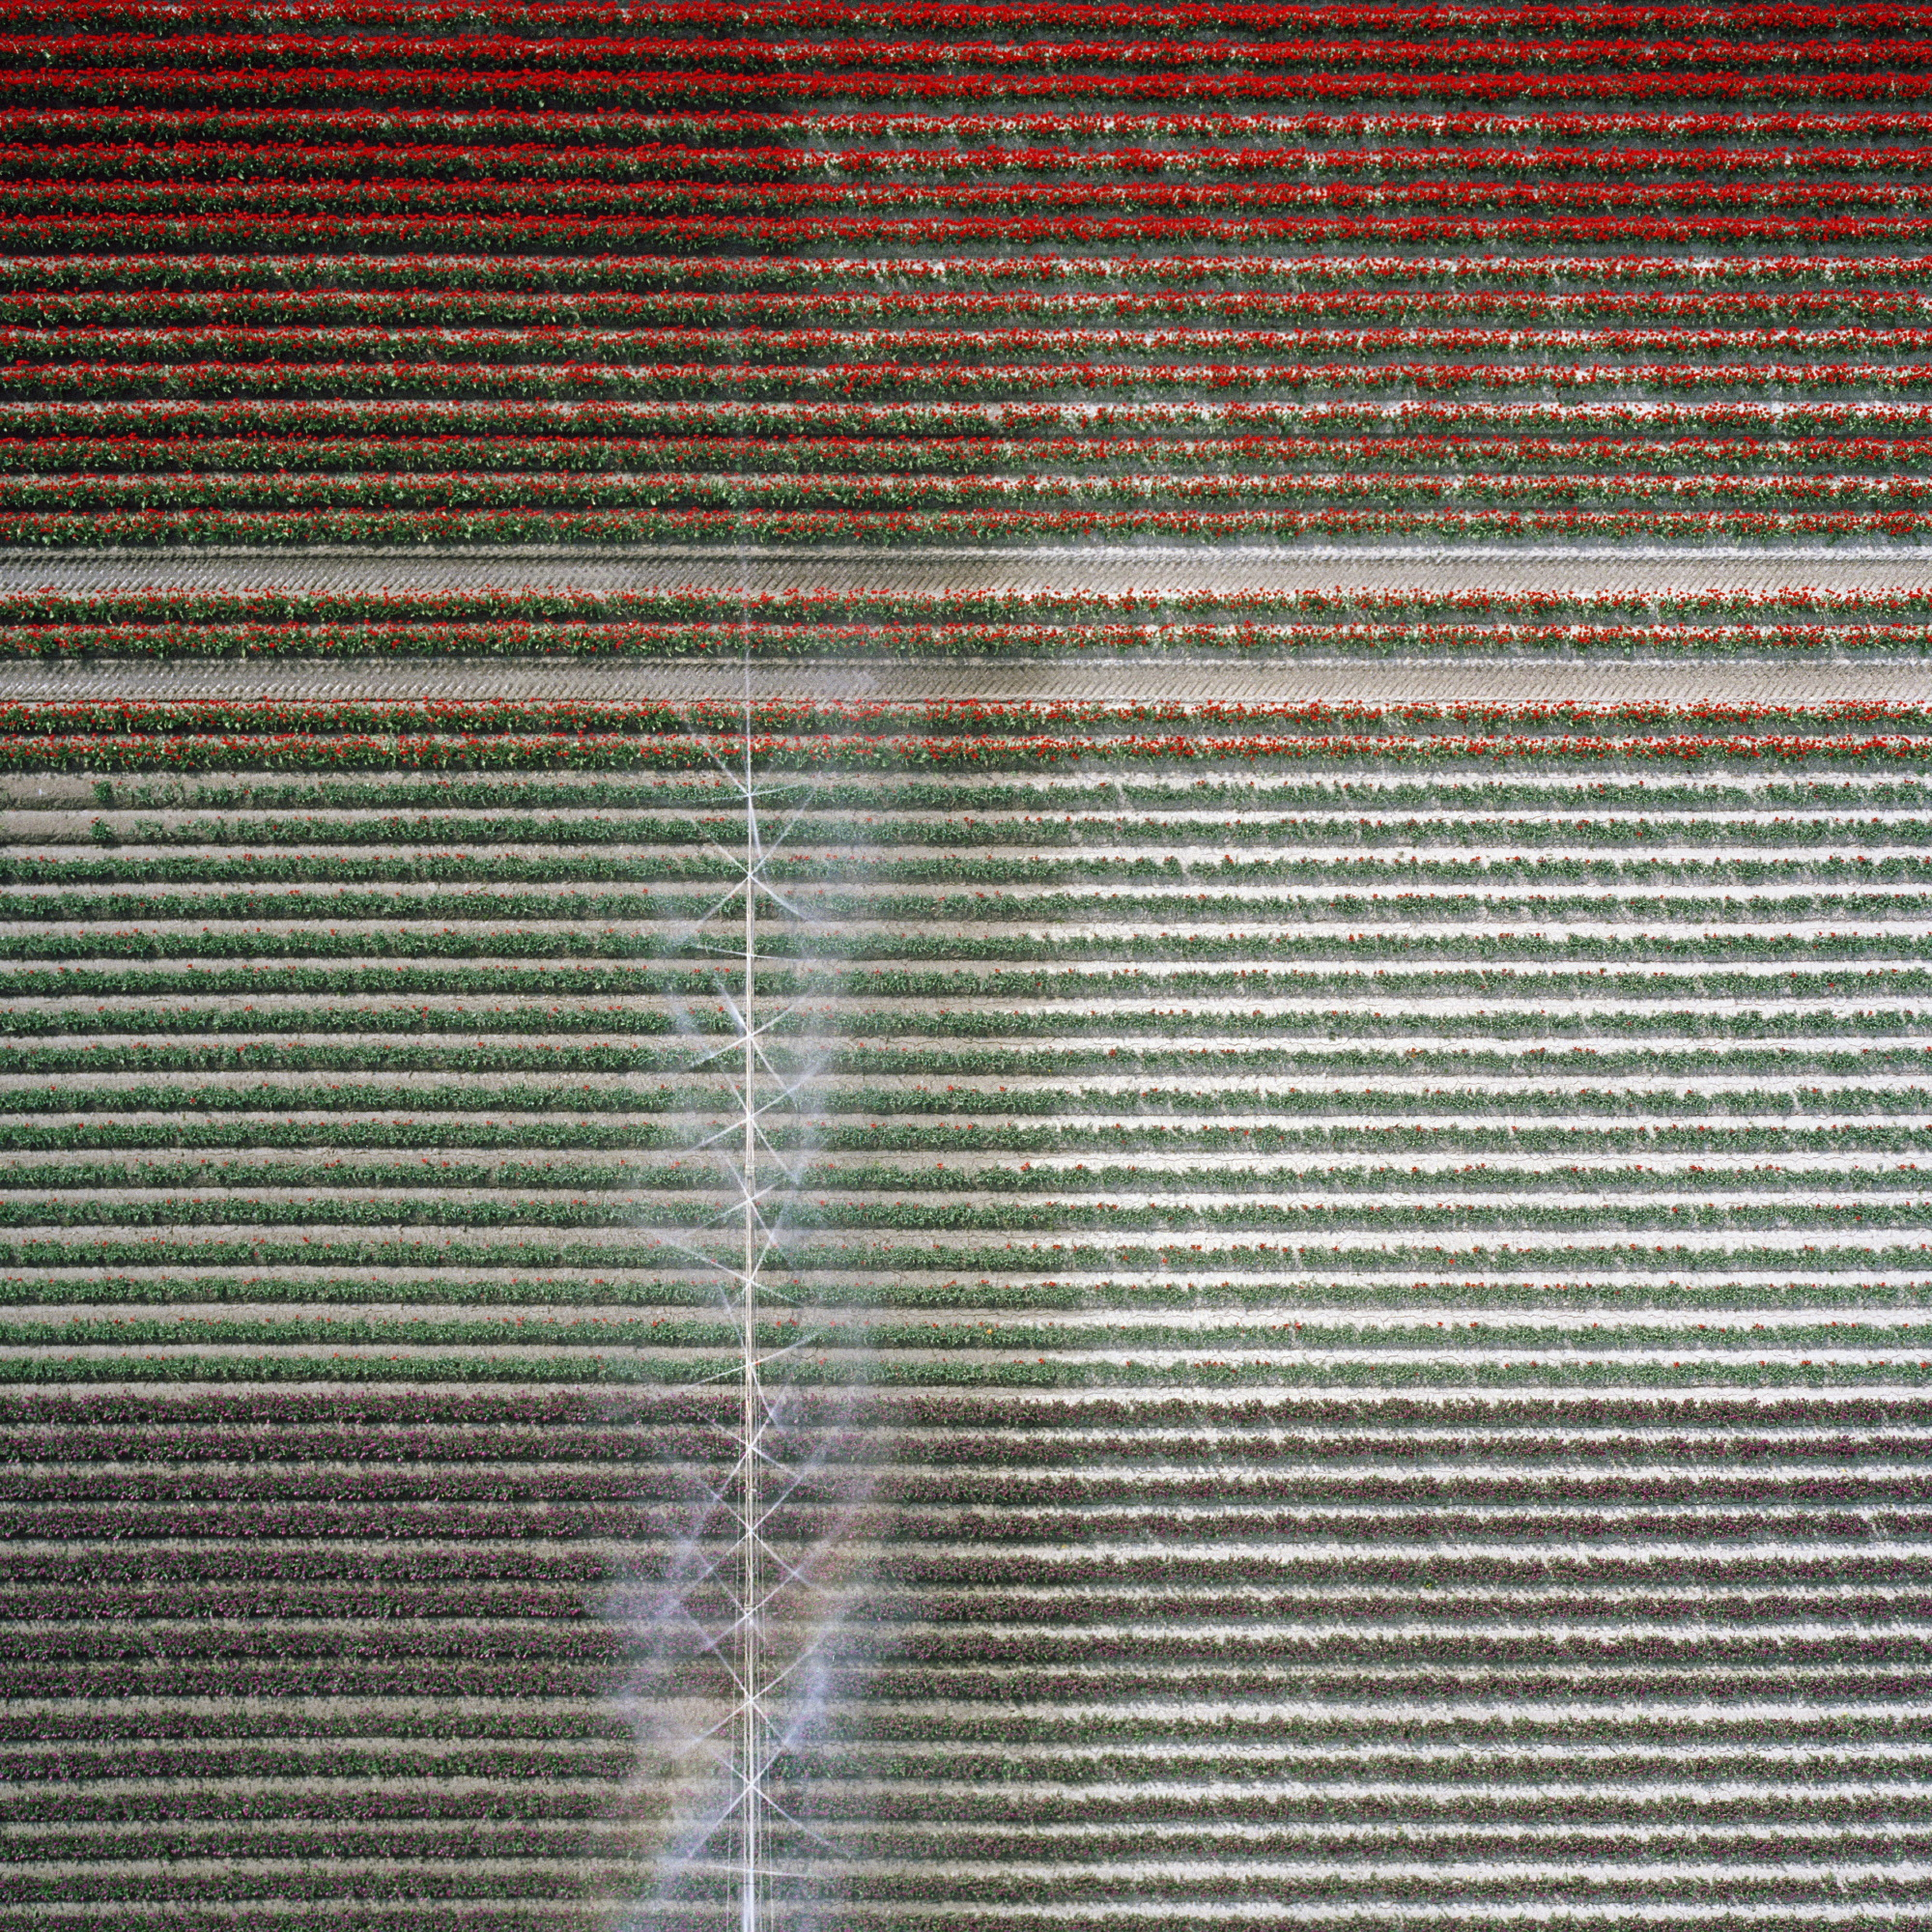 Untitled 2011 110x110cm